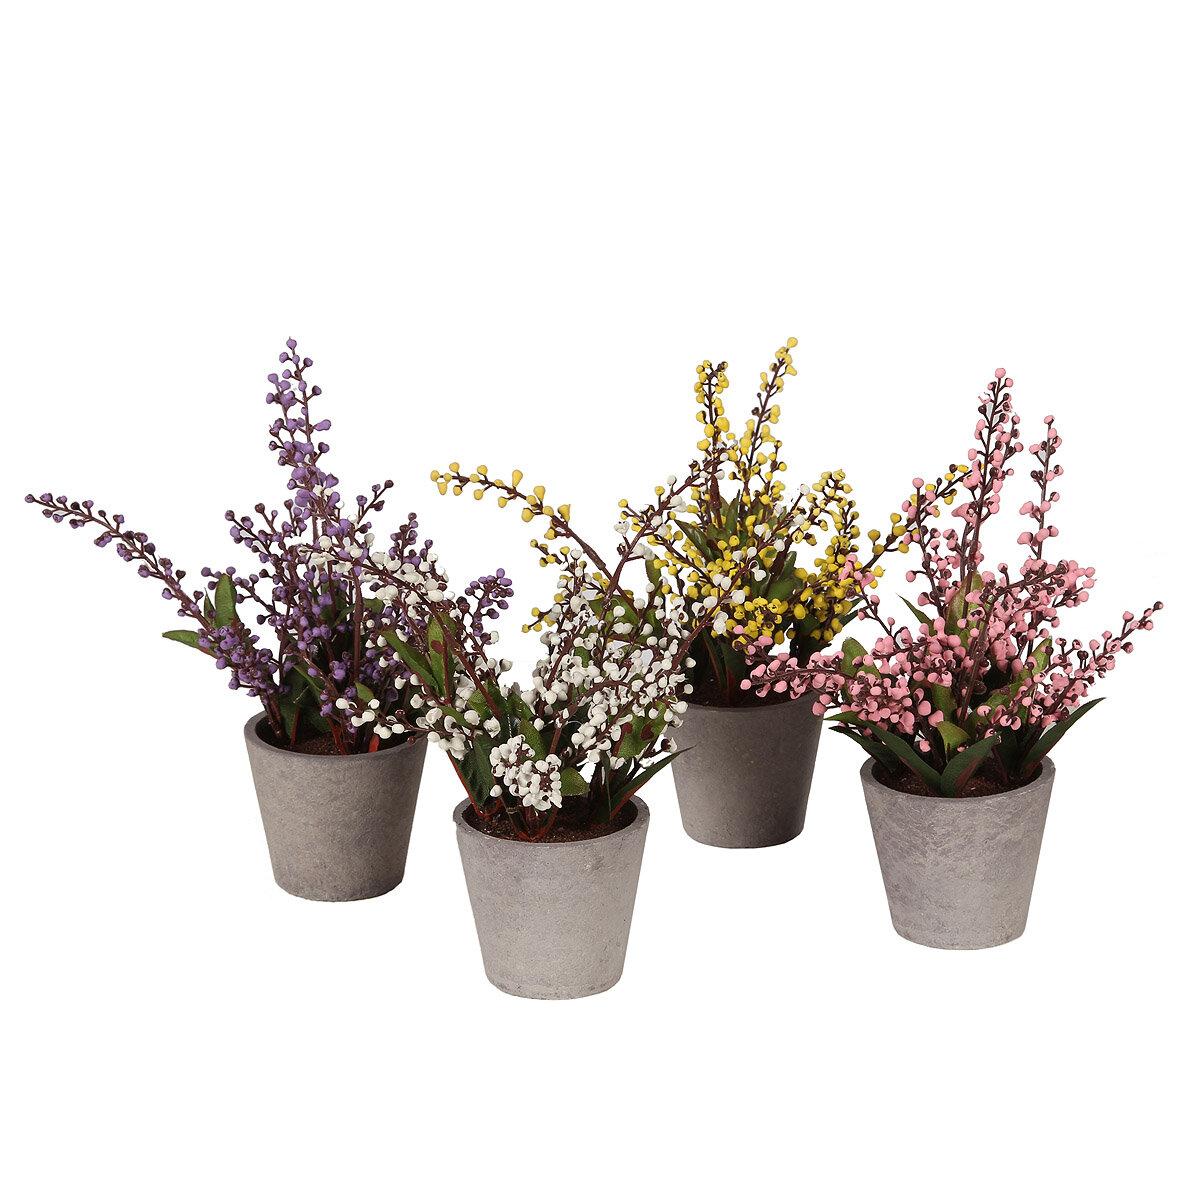 4 Piece Heather Plant Set